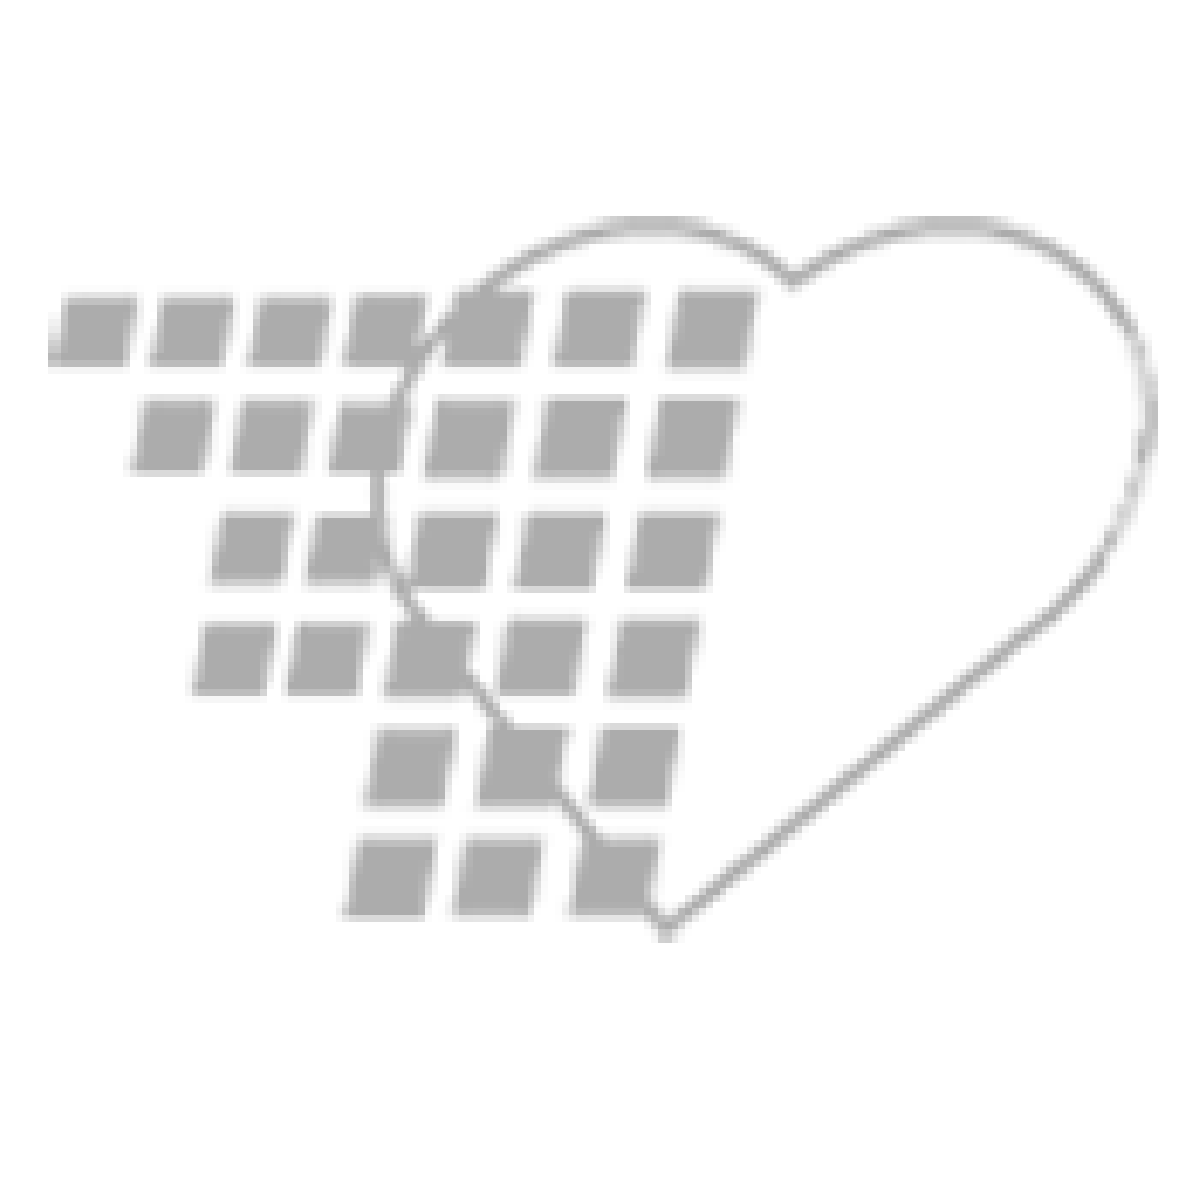 02-70-4035P ADC Fiber Optic Laryngoscope Handle